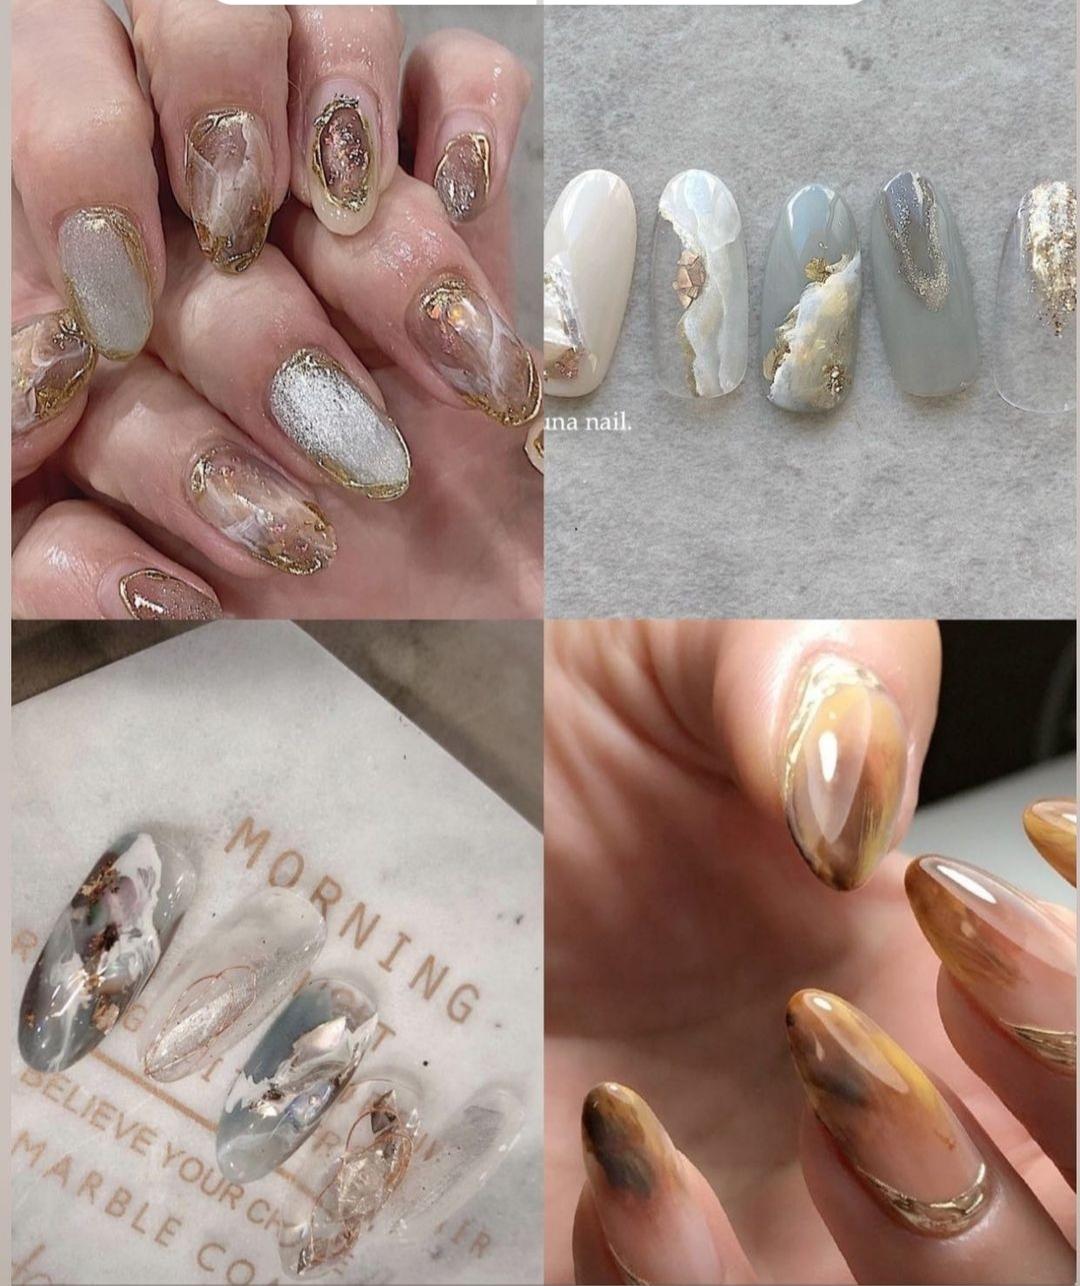 negler-negl-nails-nail-nailinspo-negleinspirasjon-inspirasjon-inspo-nailsinspo-nailinsporation-isalicious-isalicious.blogg.no-neglekunst-seashellnails-metallicmarble-pearlymarble-pearlynails